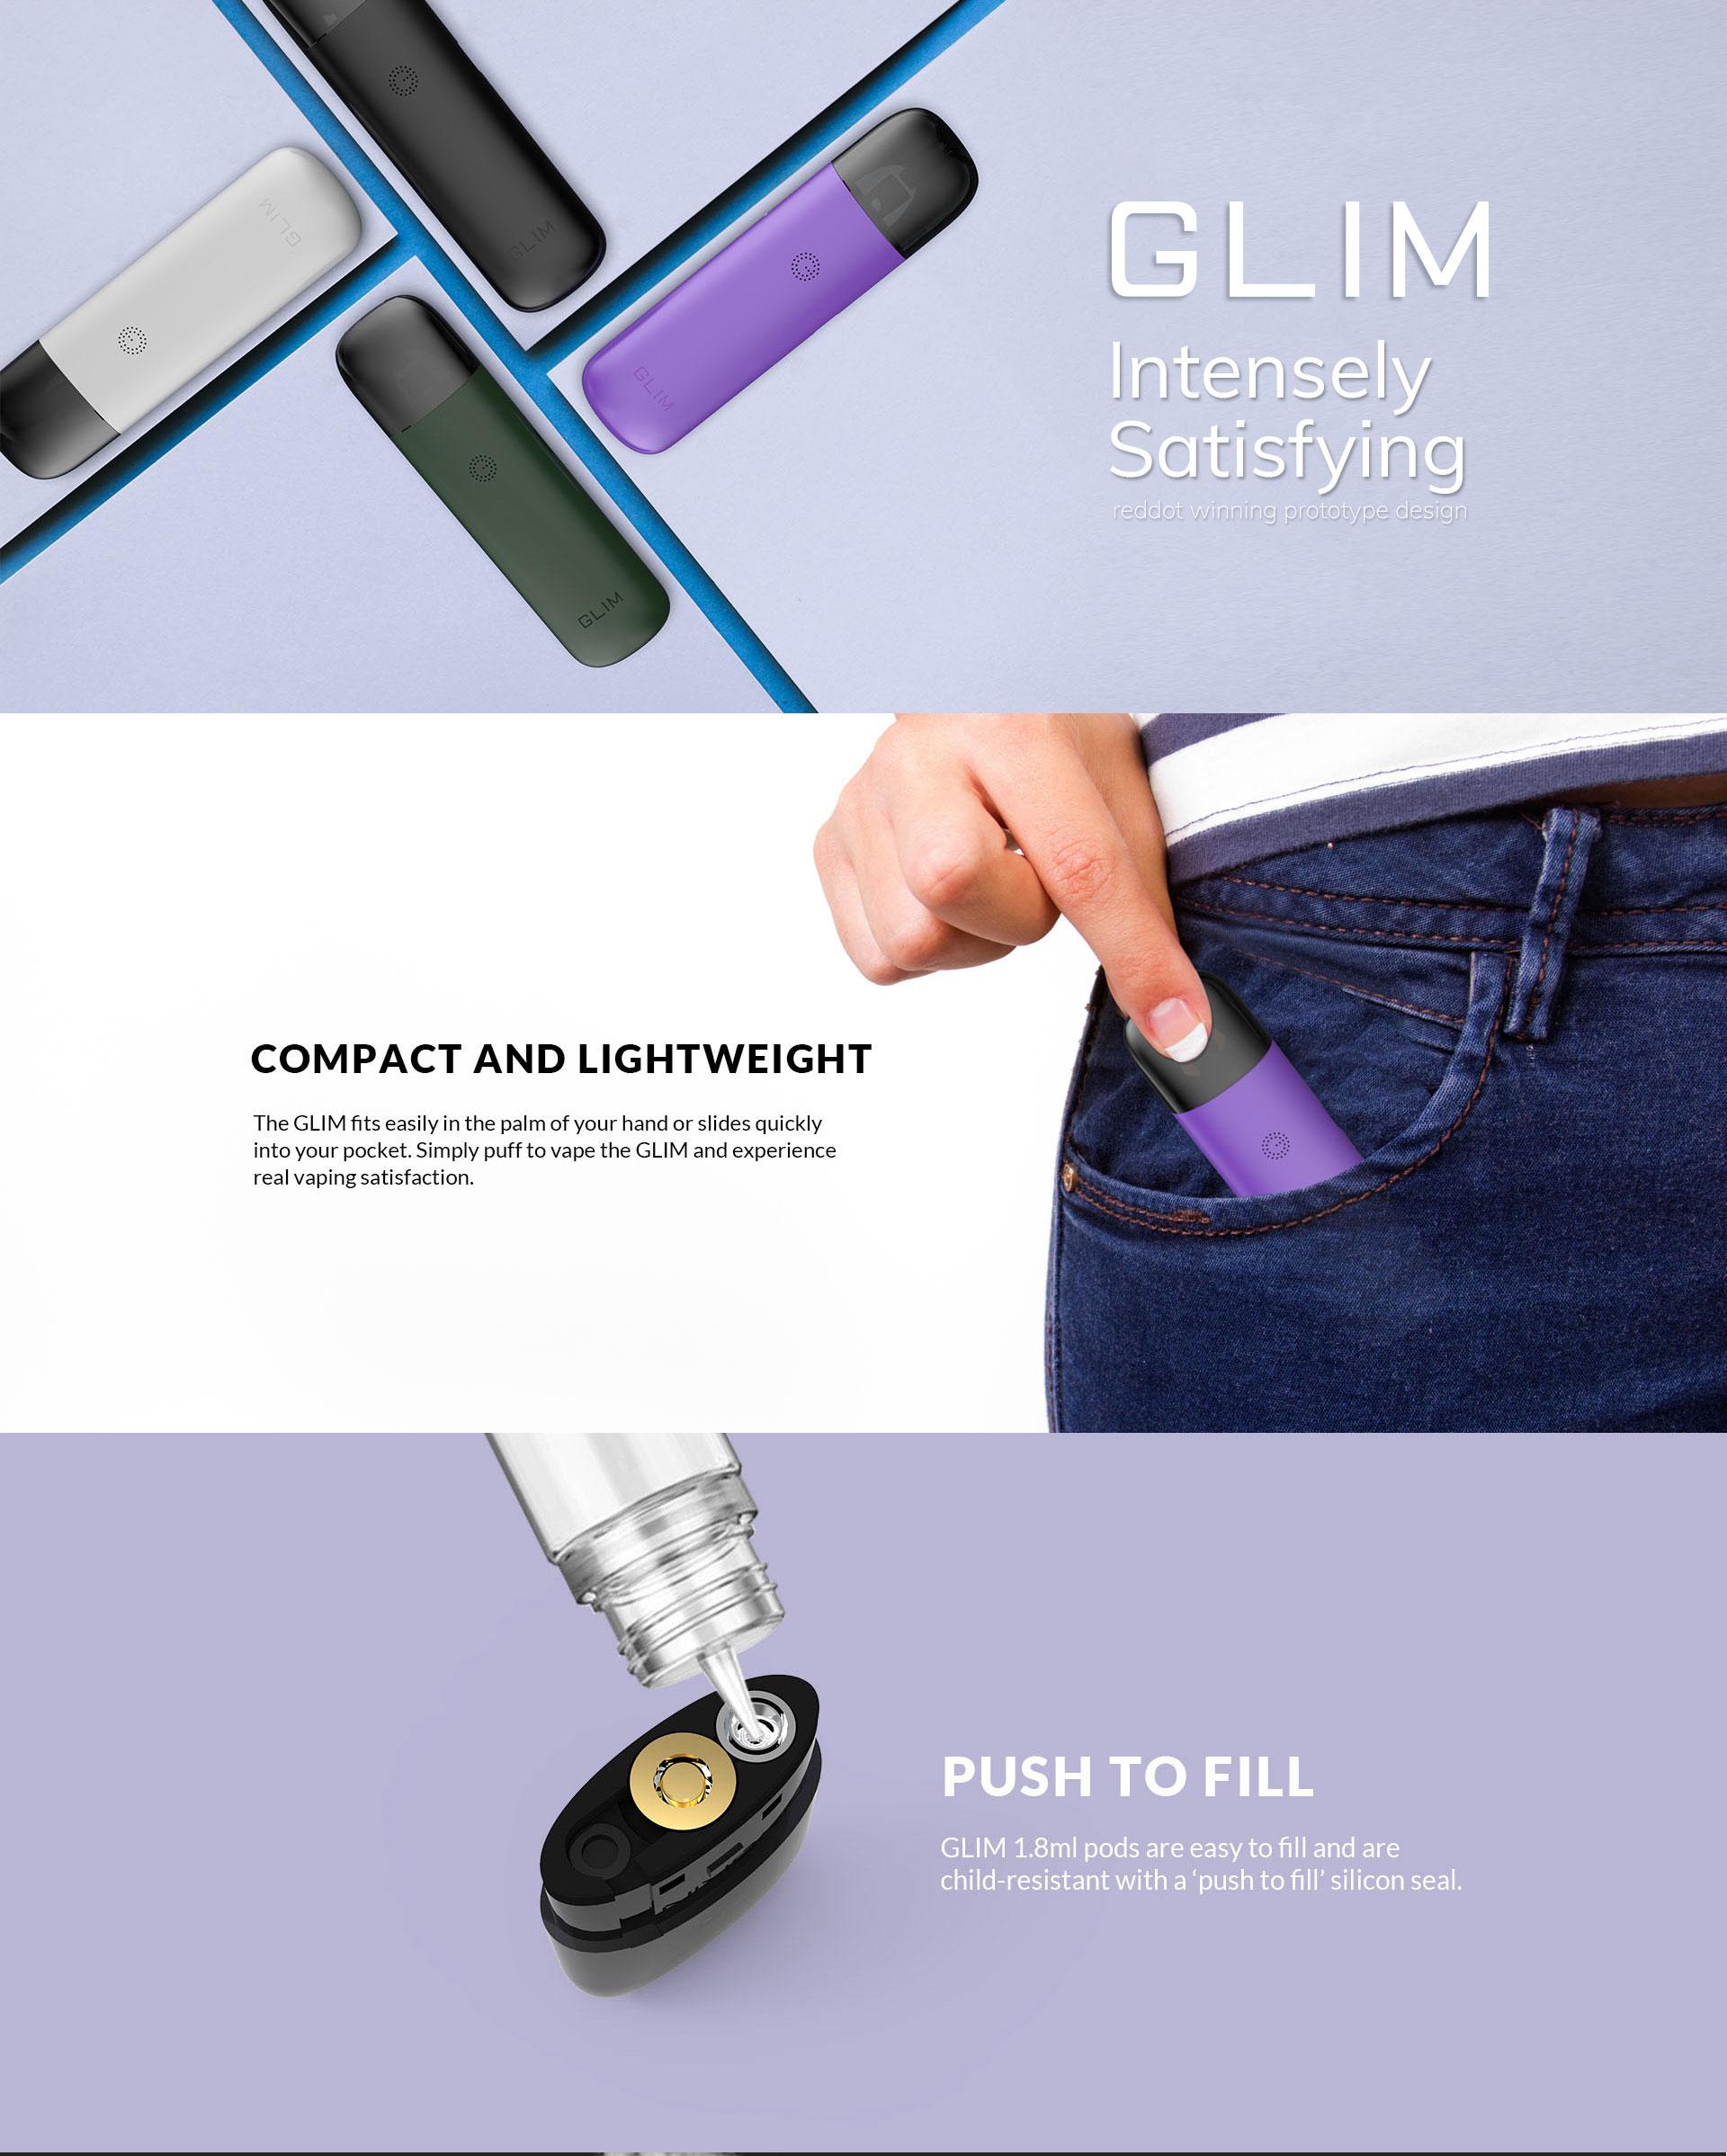 Innokin-Glim-Product-Page-1